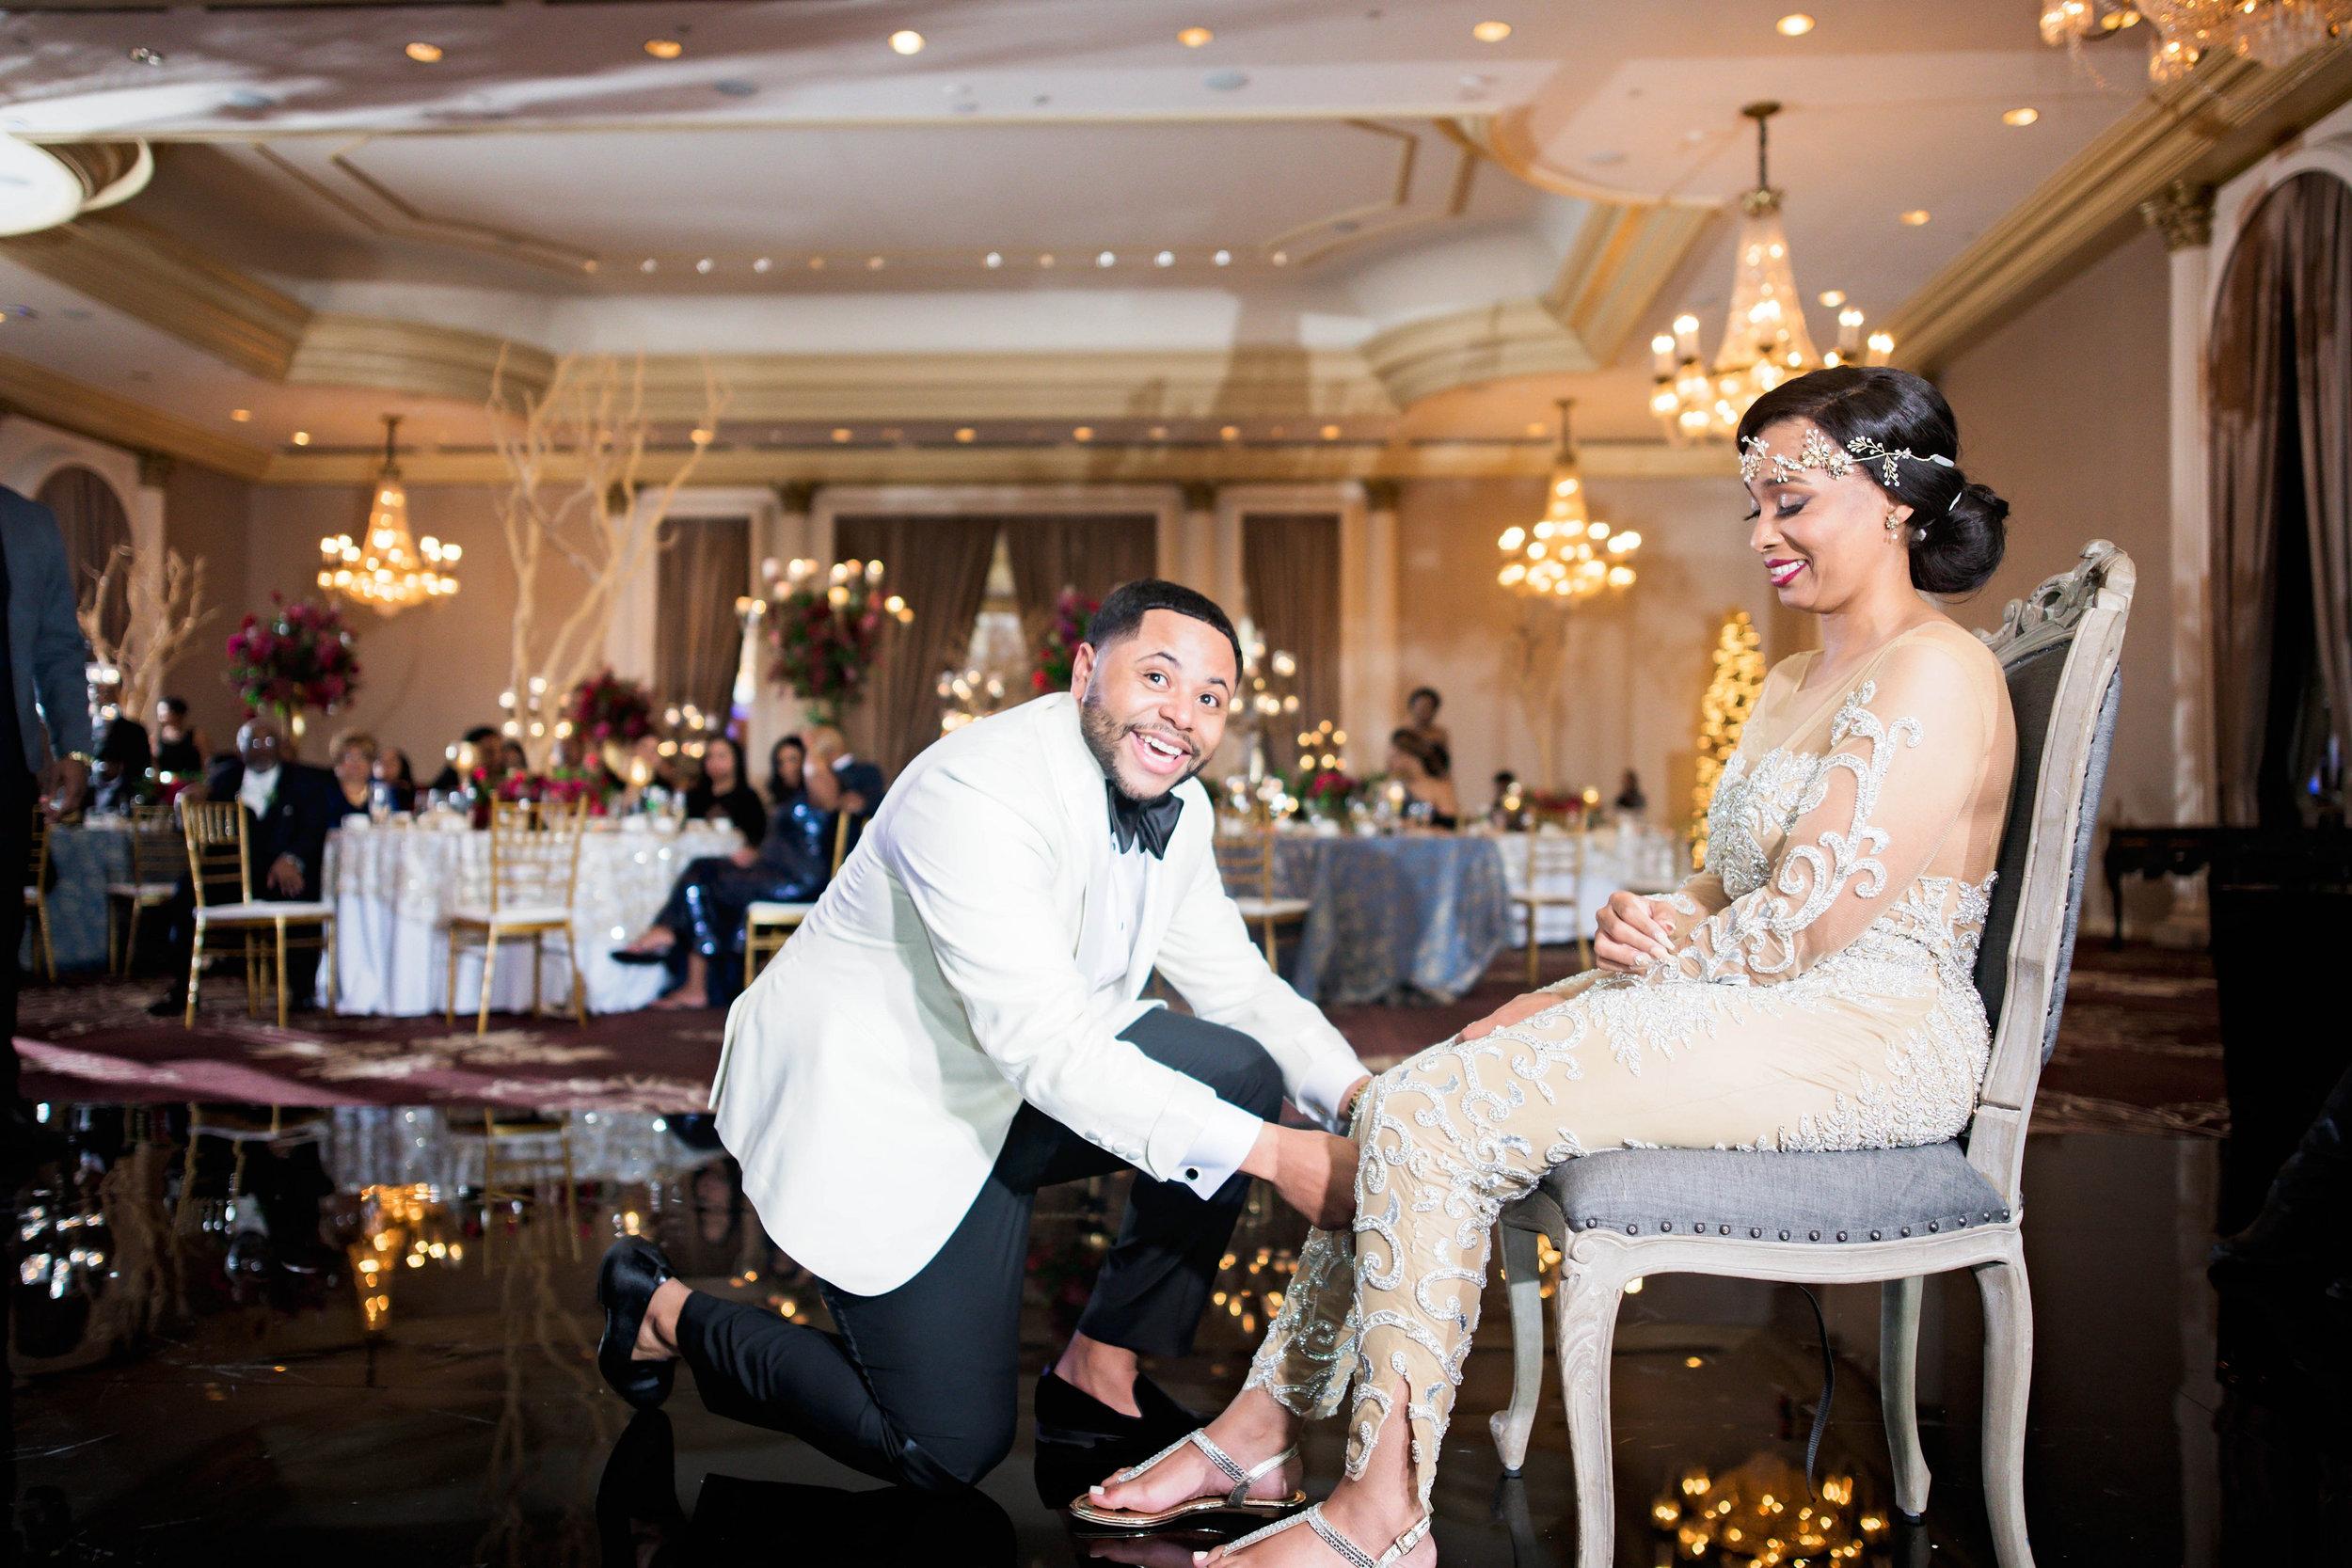 Pharris Photography- Houston Wedding- Krystyn and Joshual- Texas Wedding- Garter Toss- Lace Wedding Dress